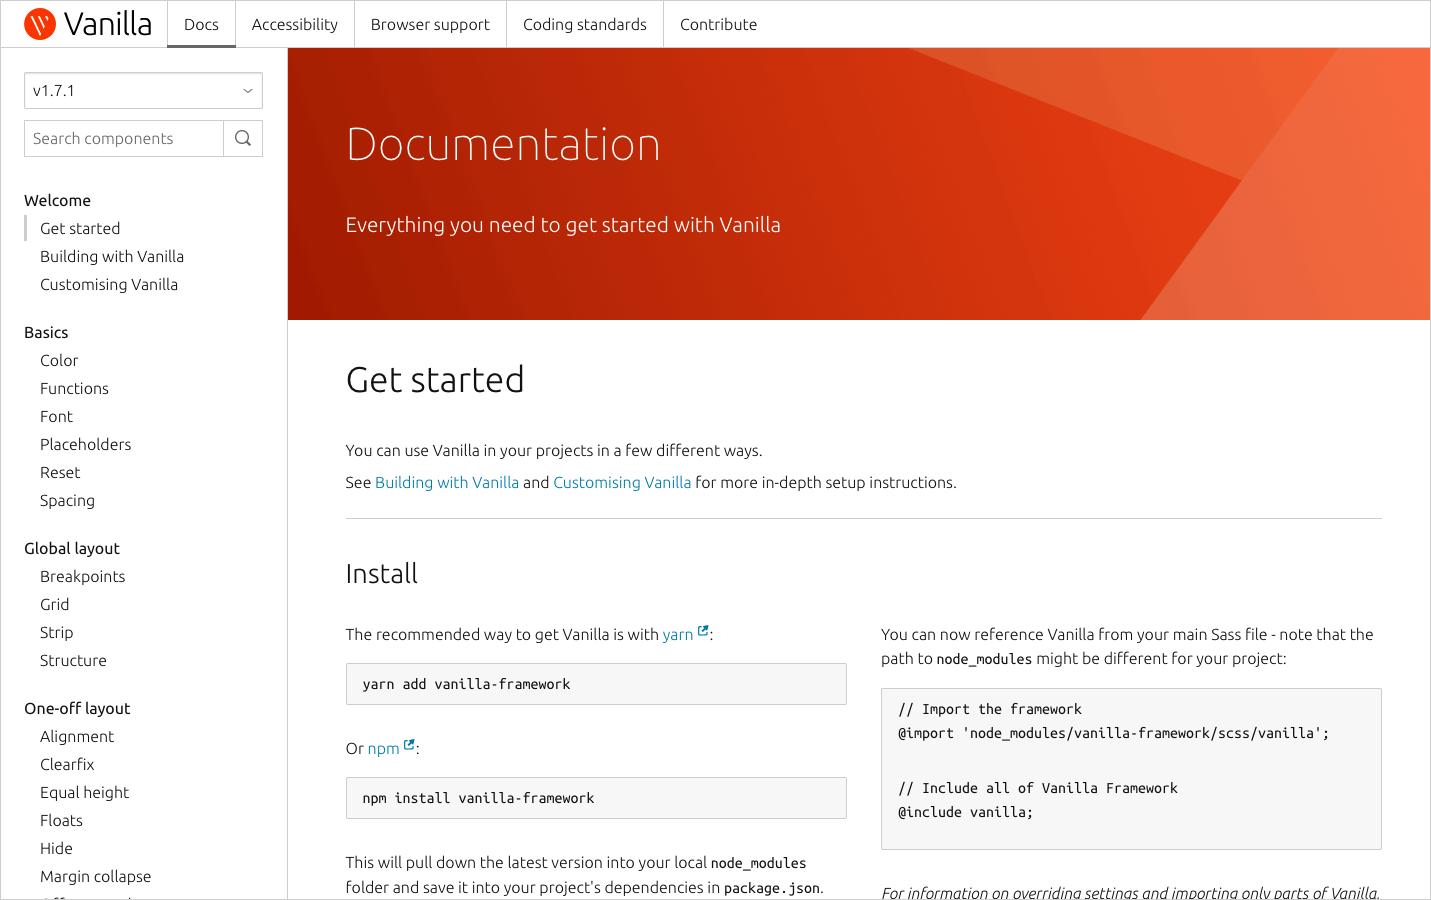 Vanilla documentation